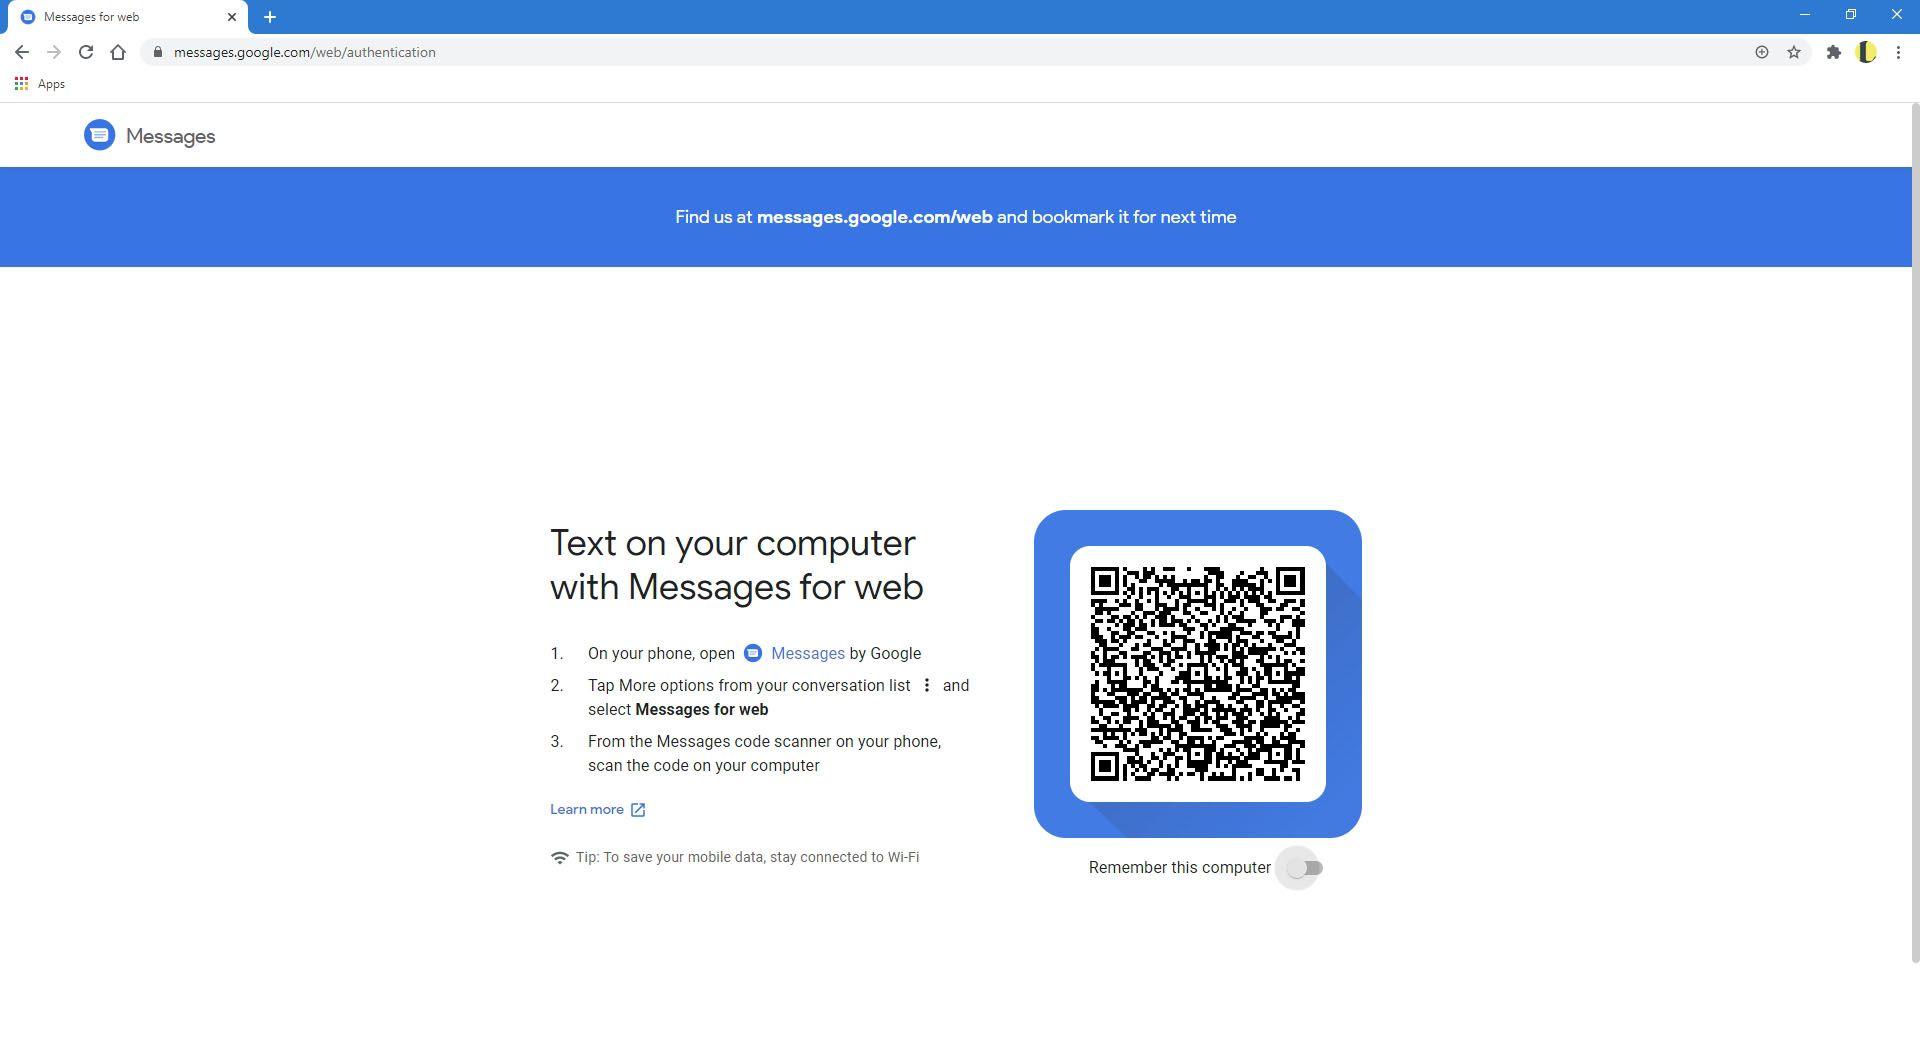 Google Messages website.